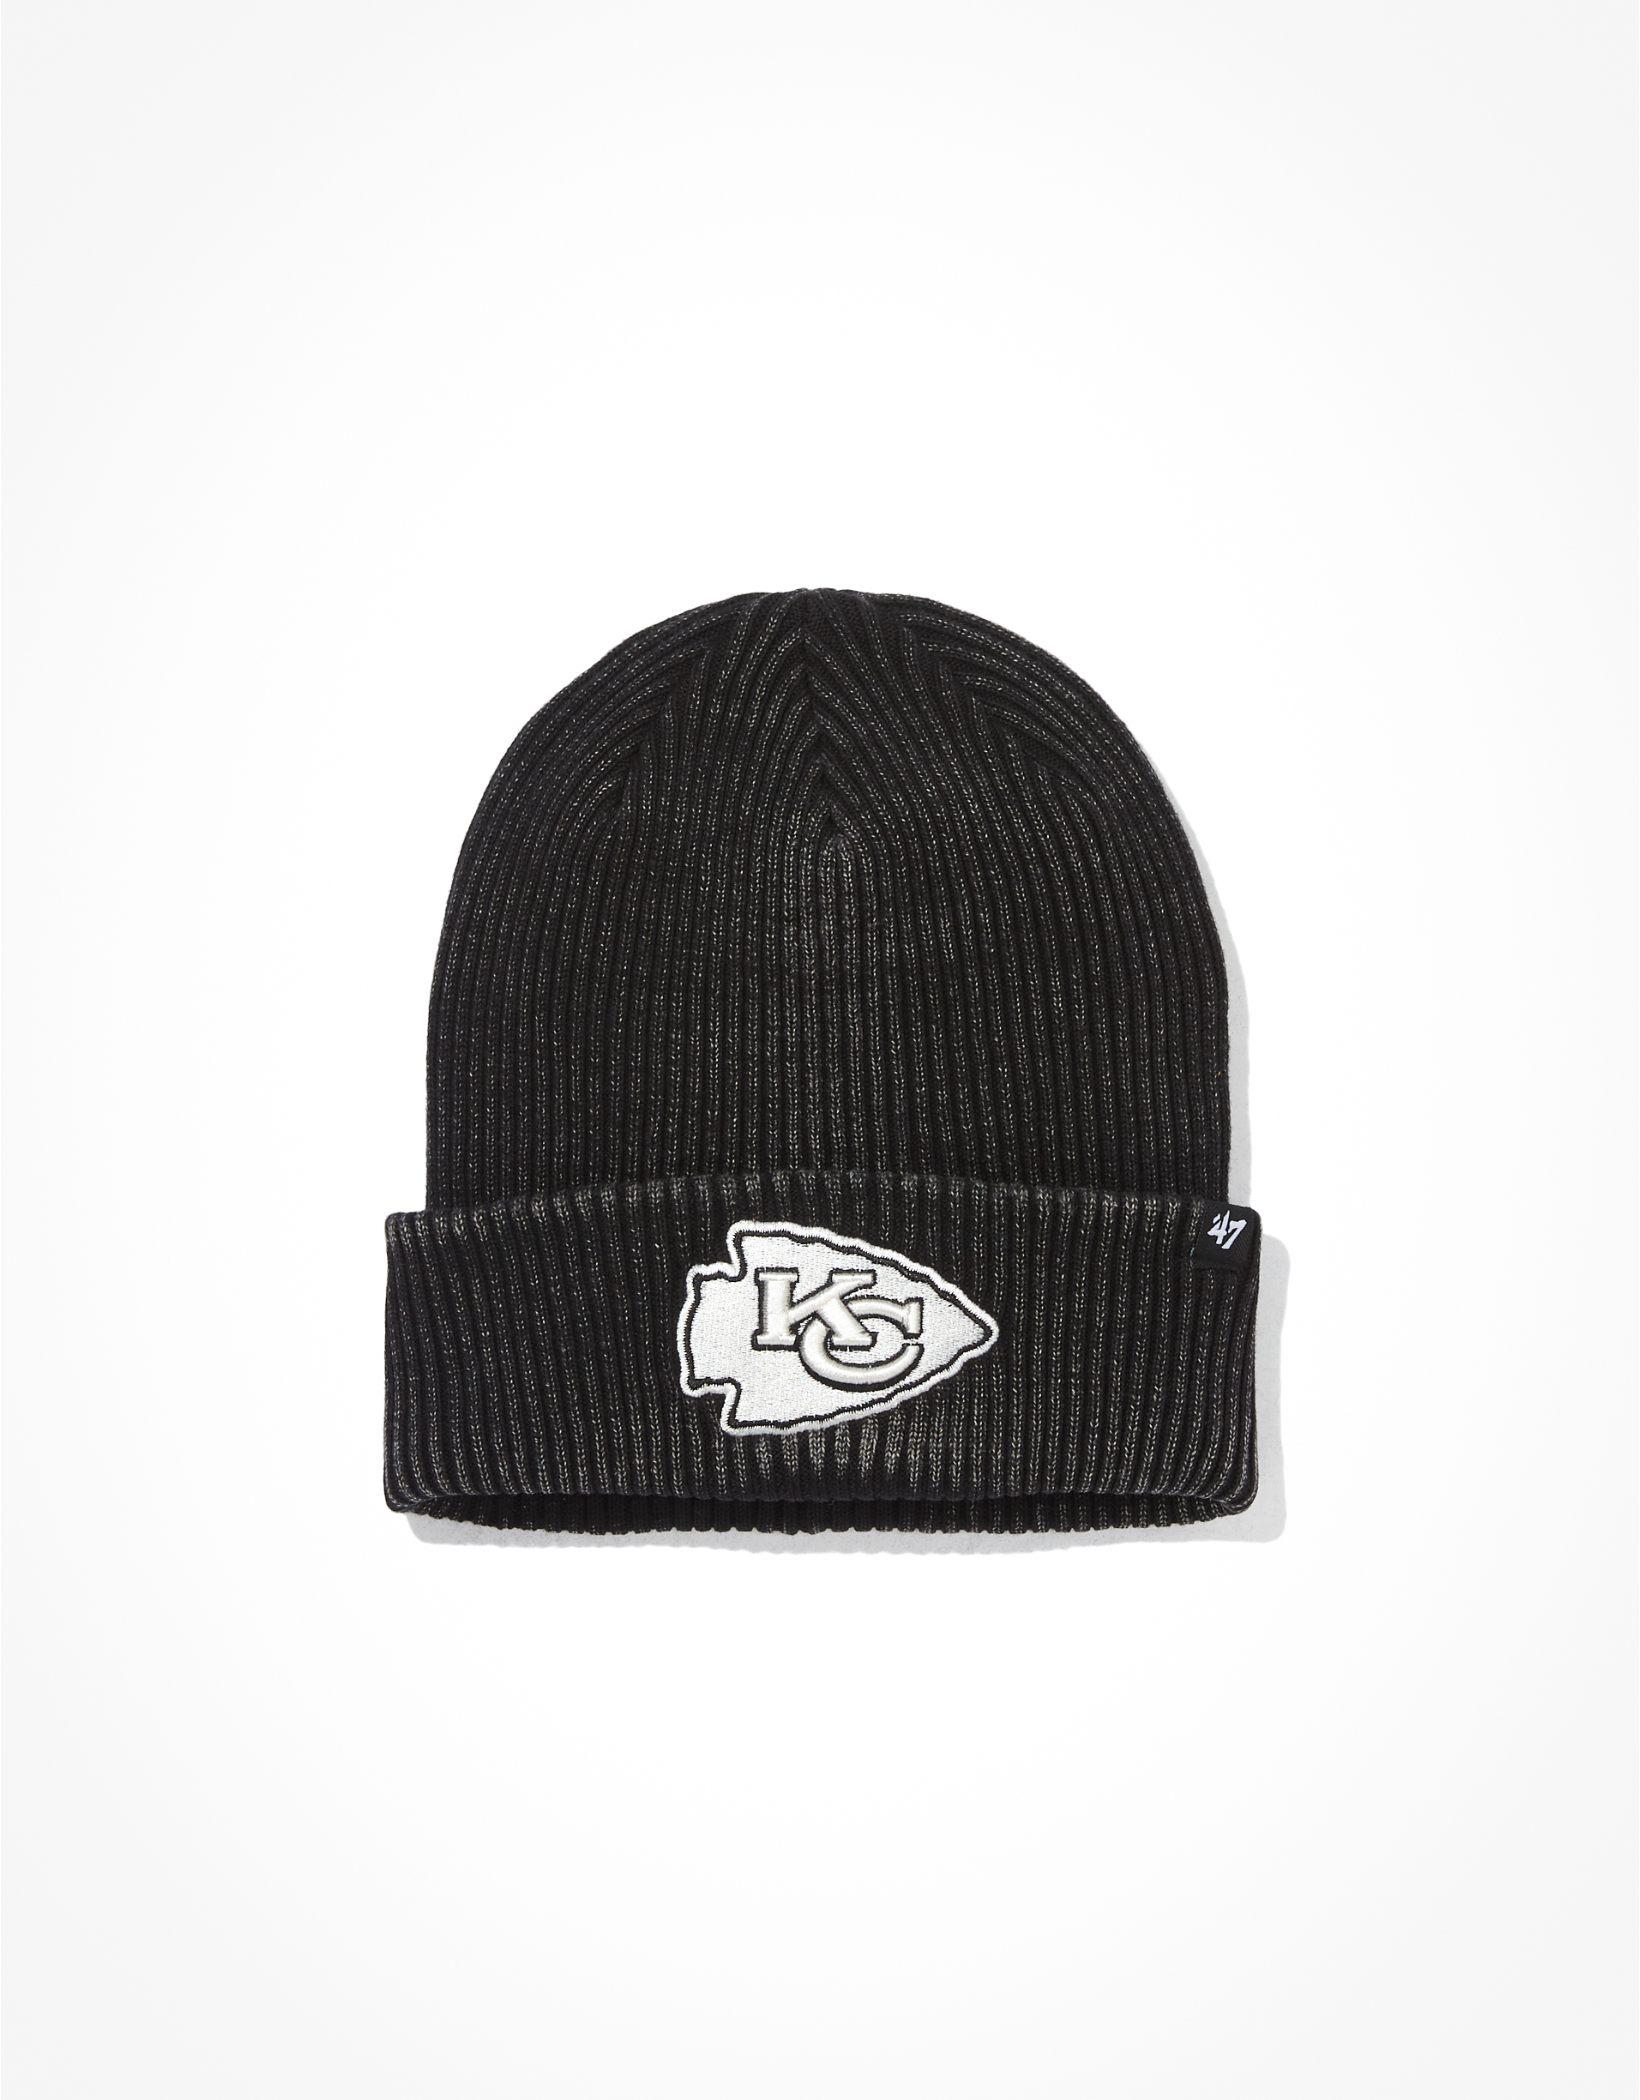 '47 Kansas City Chiefs Knit Beanie